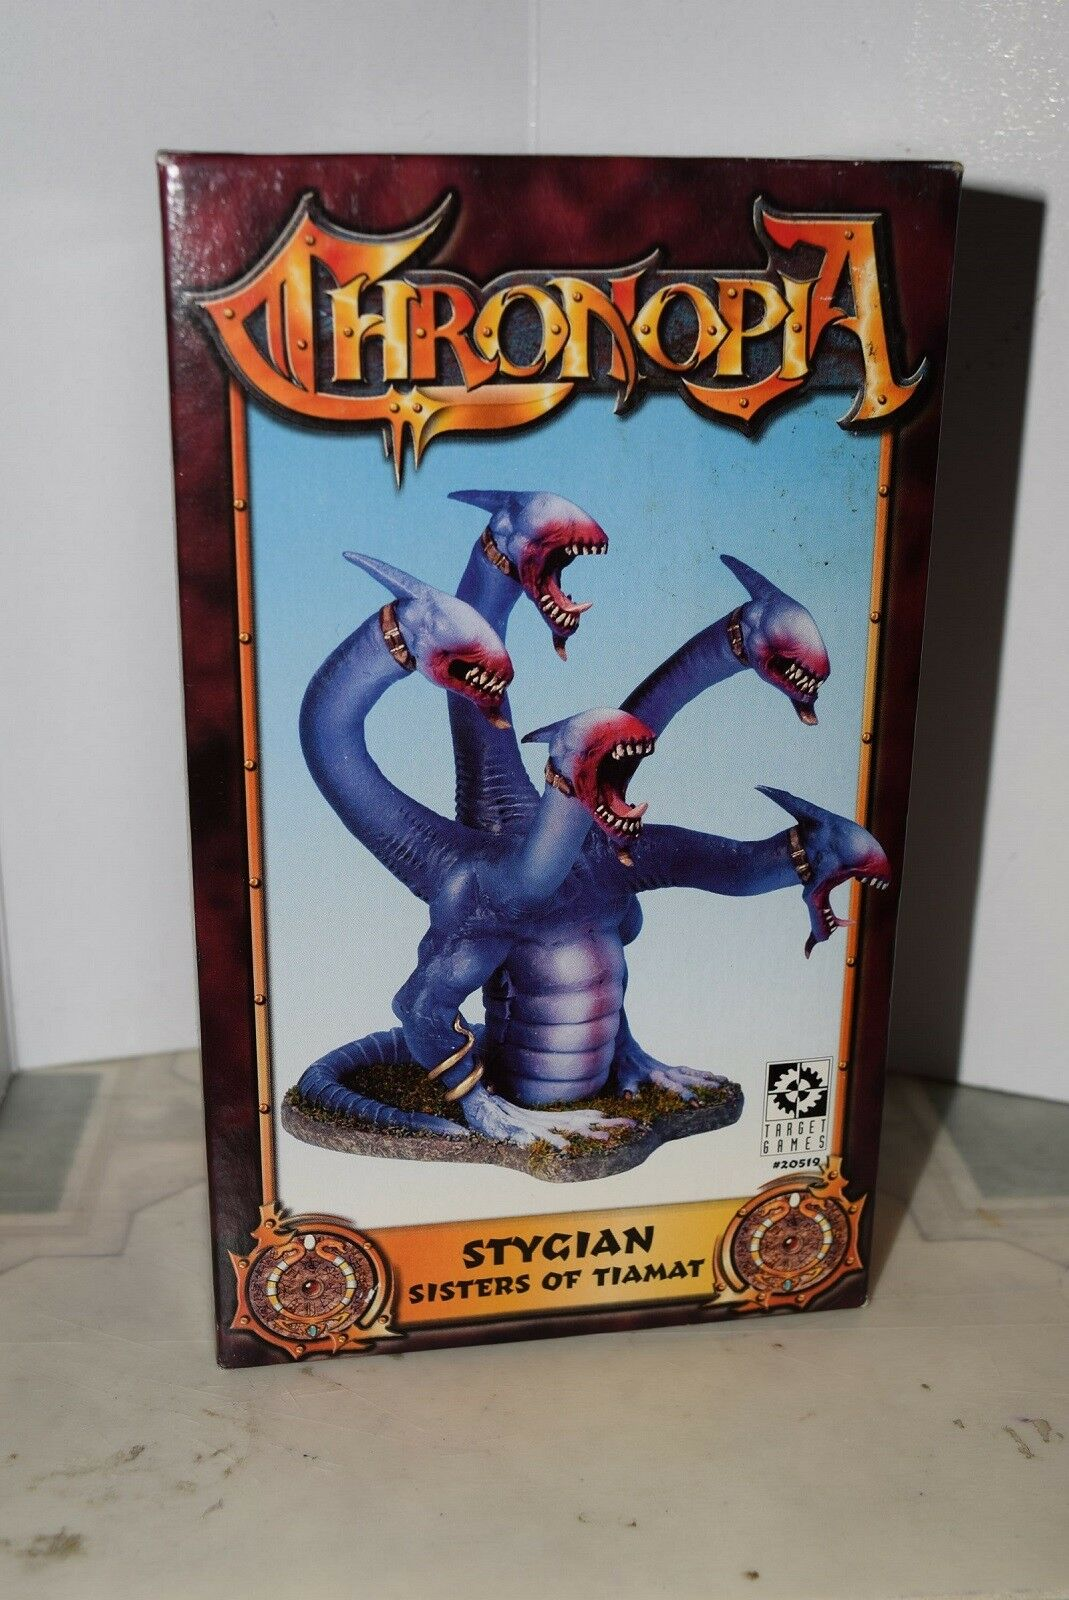 CHRONOPIA Stygian hermanas de Tiamat  Caos de Warhammer elfos oscuros hidra (Khaine)